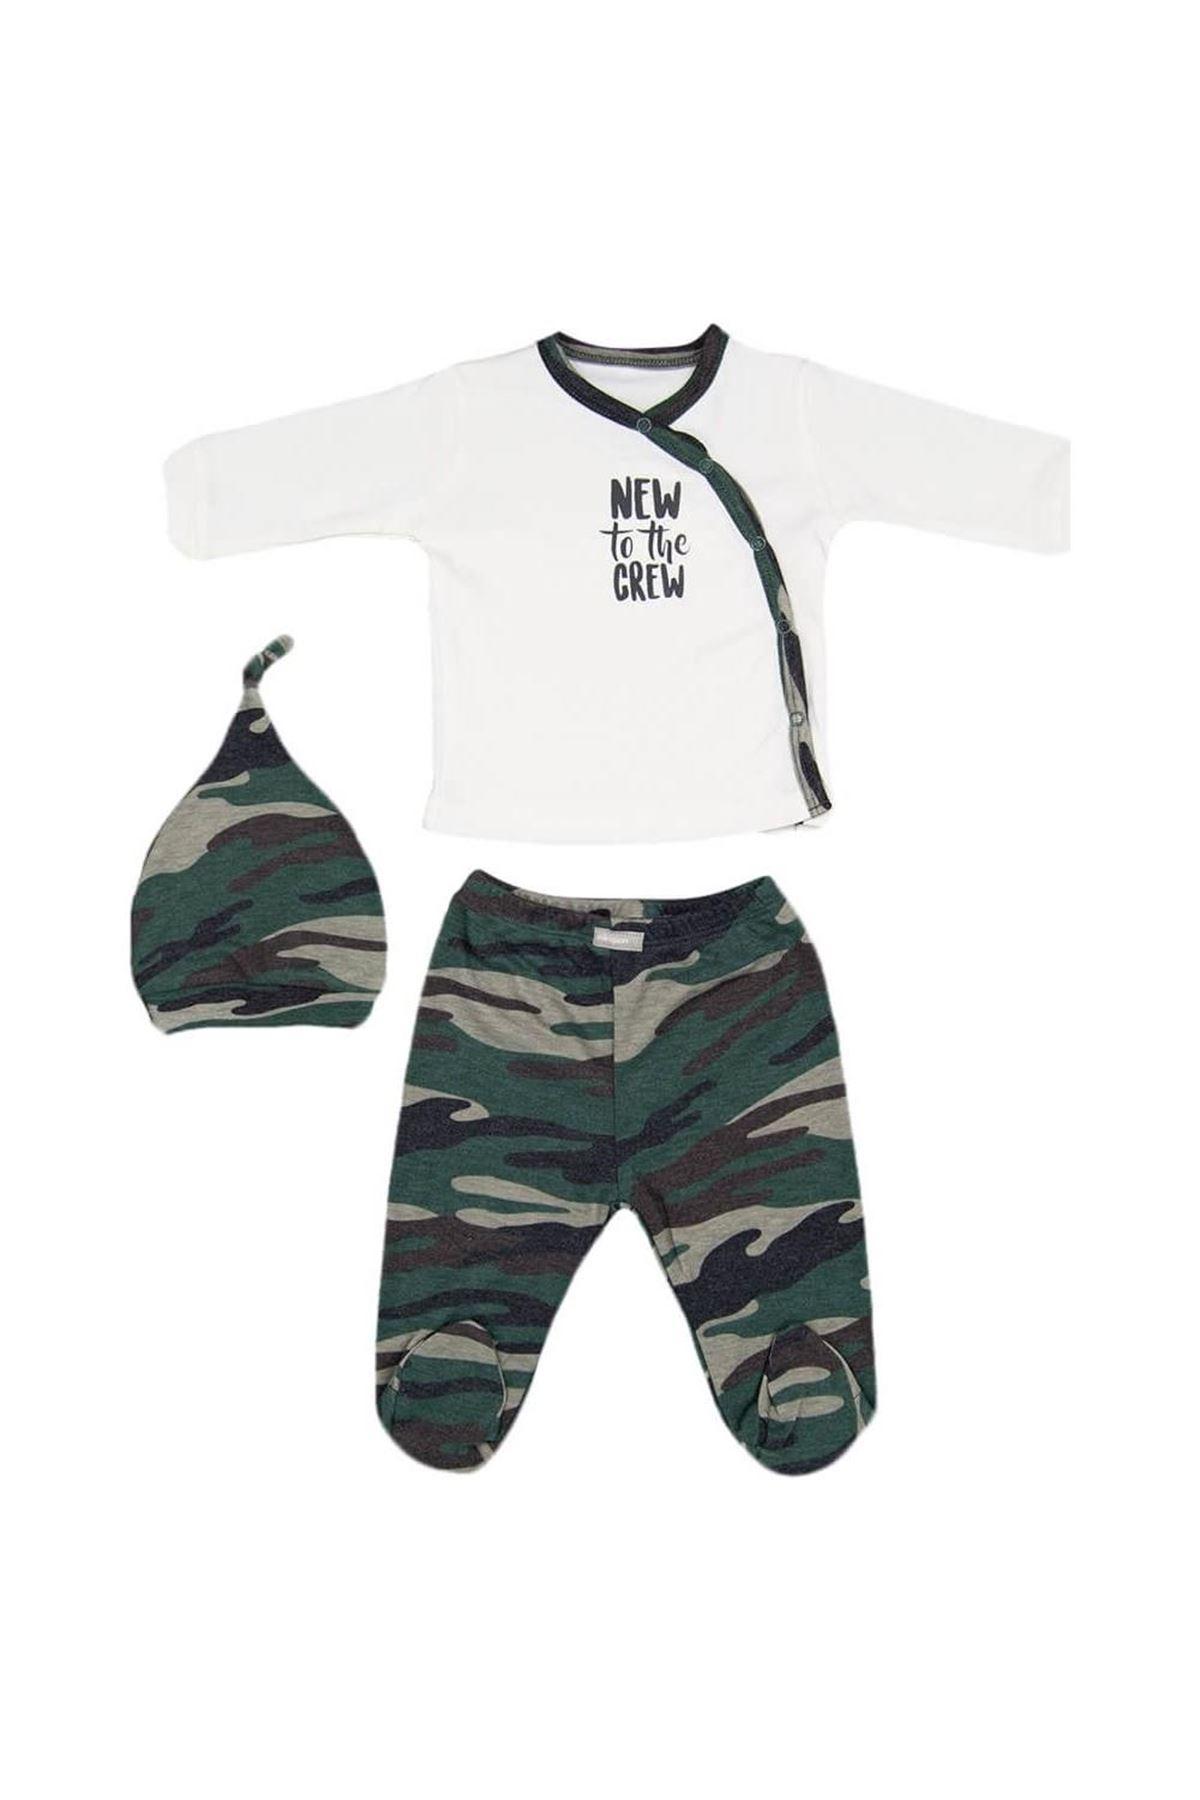 Bebepan Camo 3lü Bebe Takım 1996 Kamuflaj